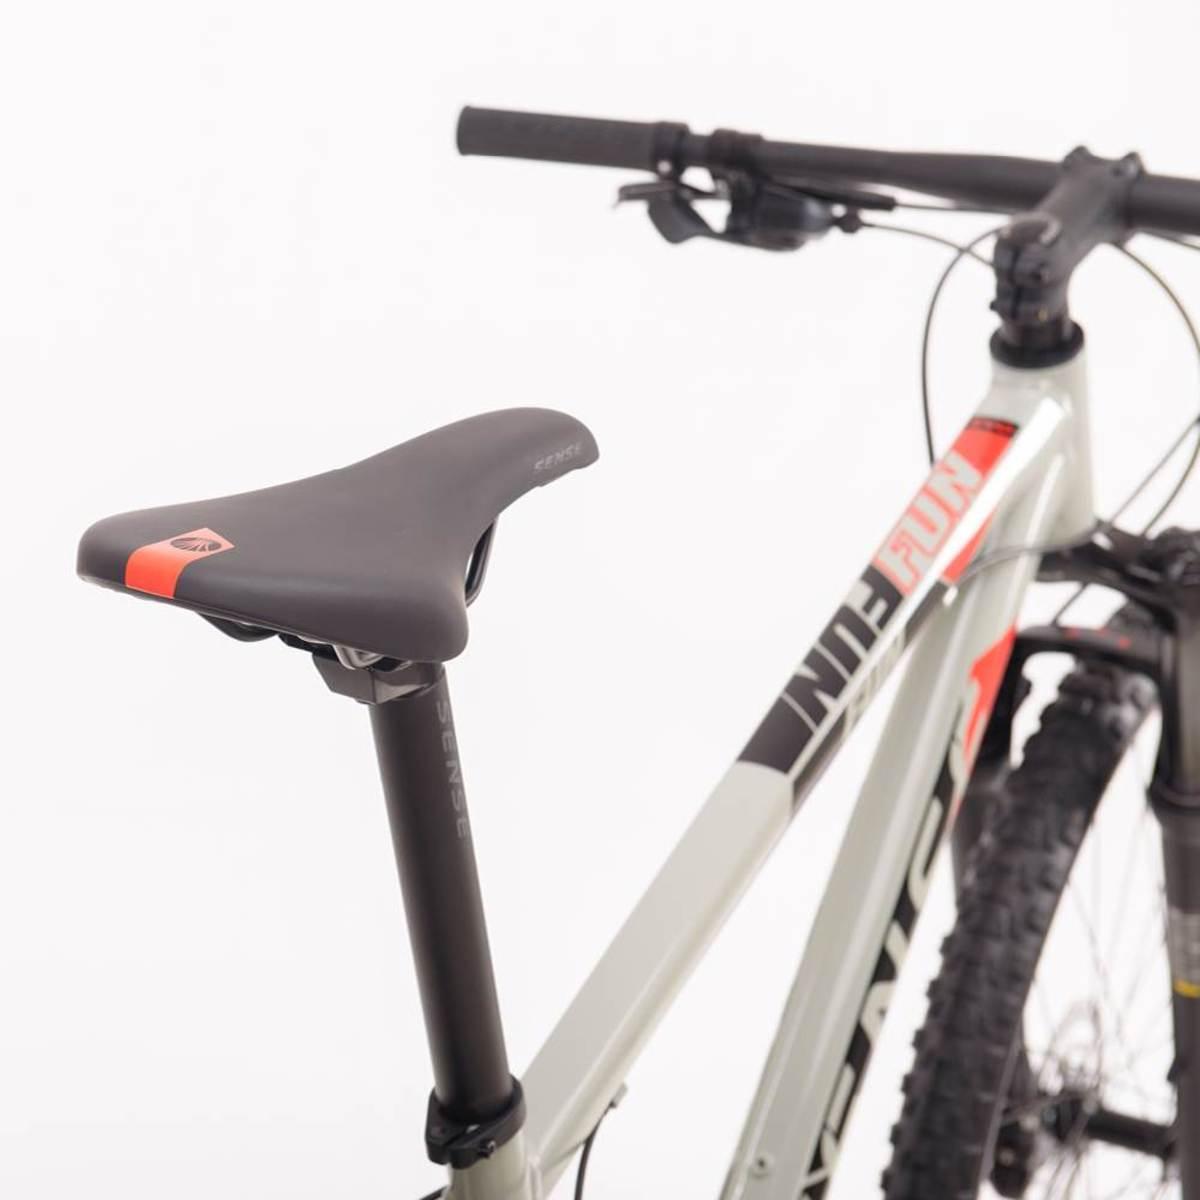 Bicicleta SENSE Fun Evo 2021 - 18v Shimano Alivio - Freio Shimano Hidráulico - Cinza/Vermelho